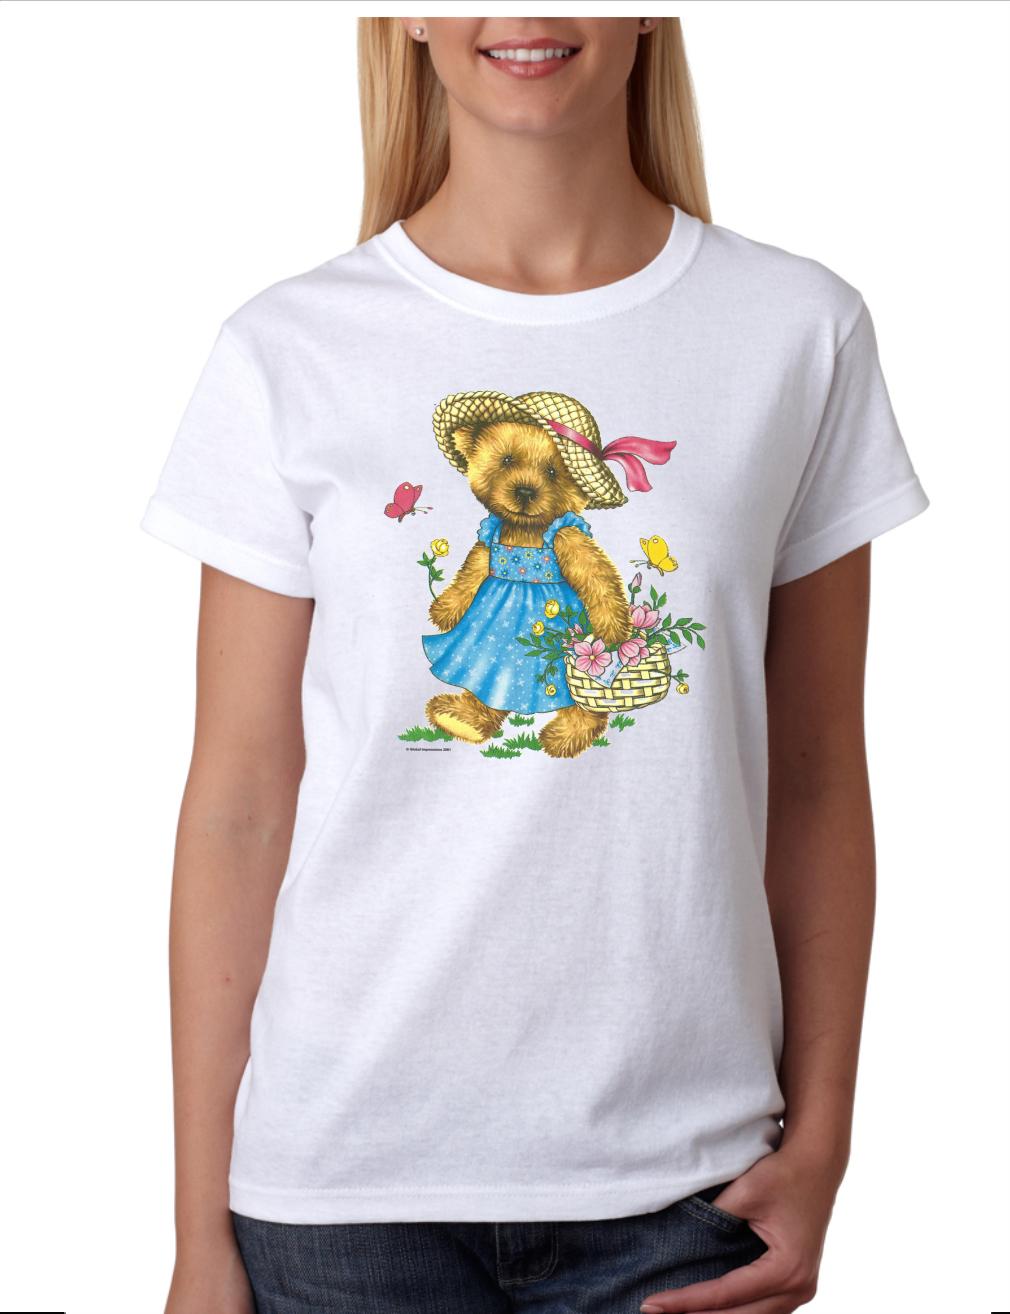 USA Made Bayside T-shirt Teddy Bear Girl Doll With Flower Fl